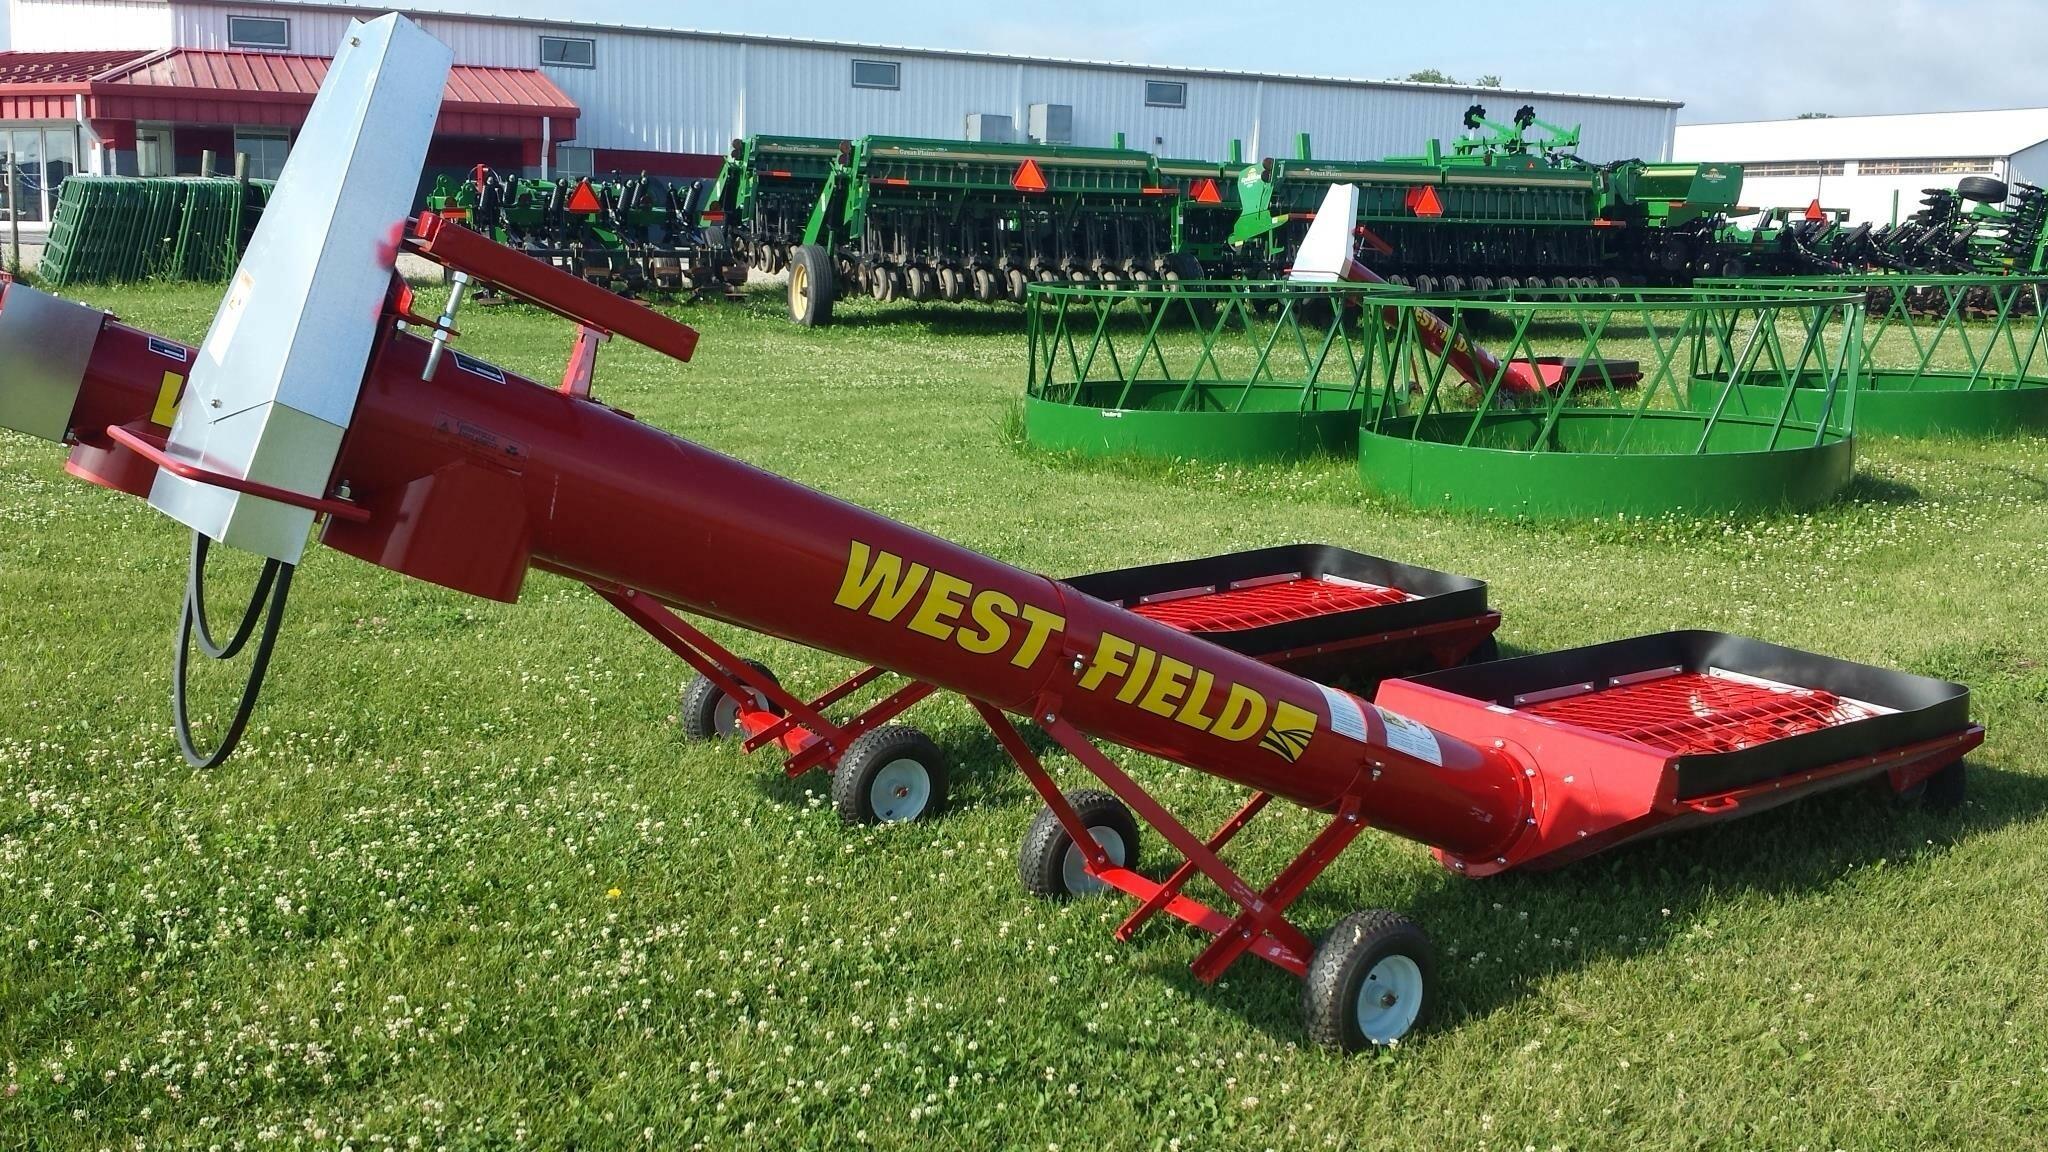 Westfield S10-9 Augers and Conveyor